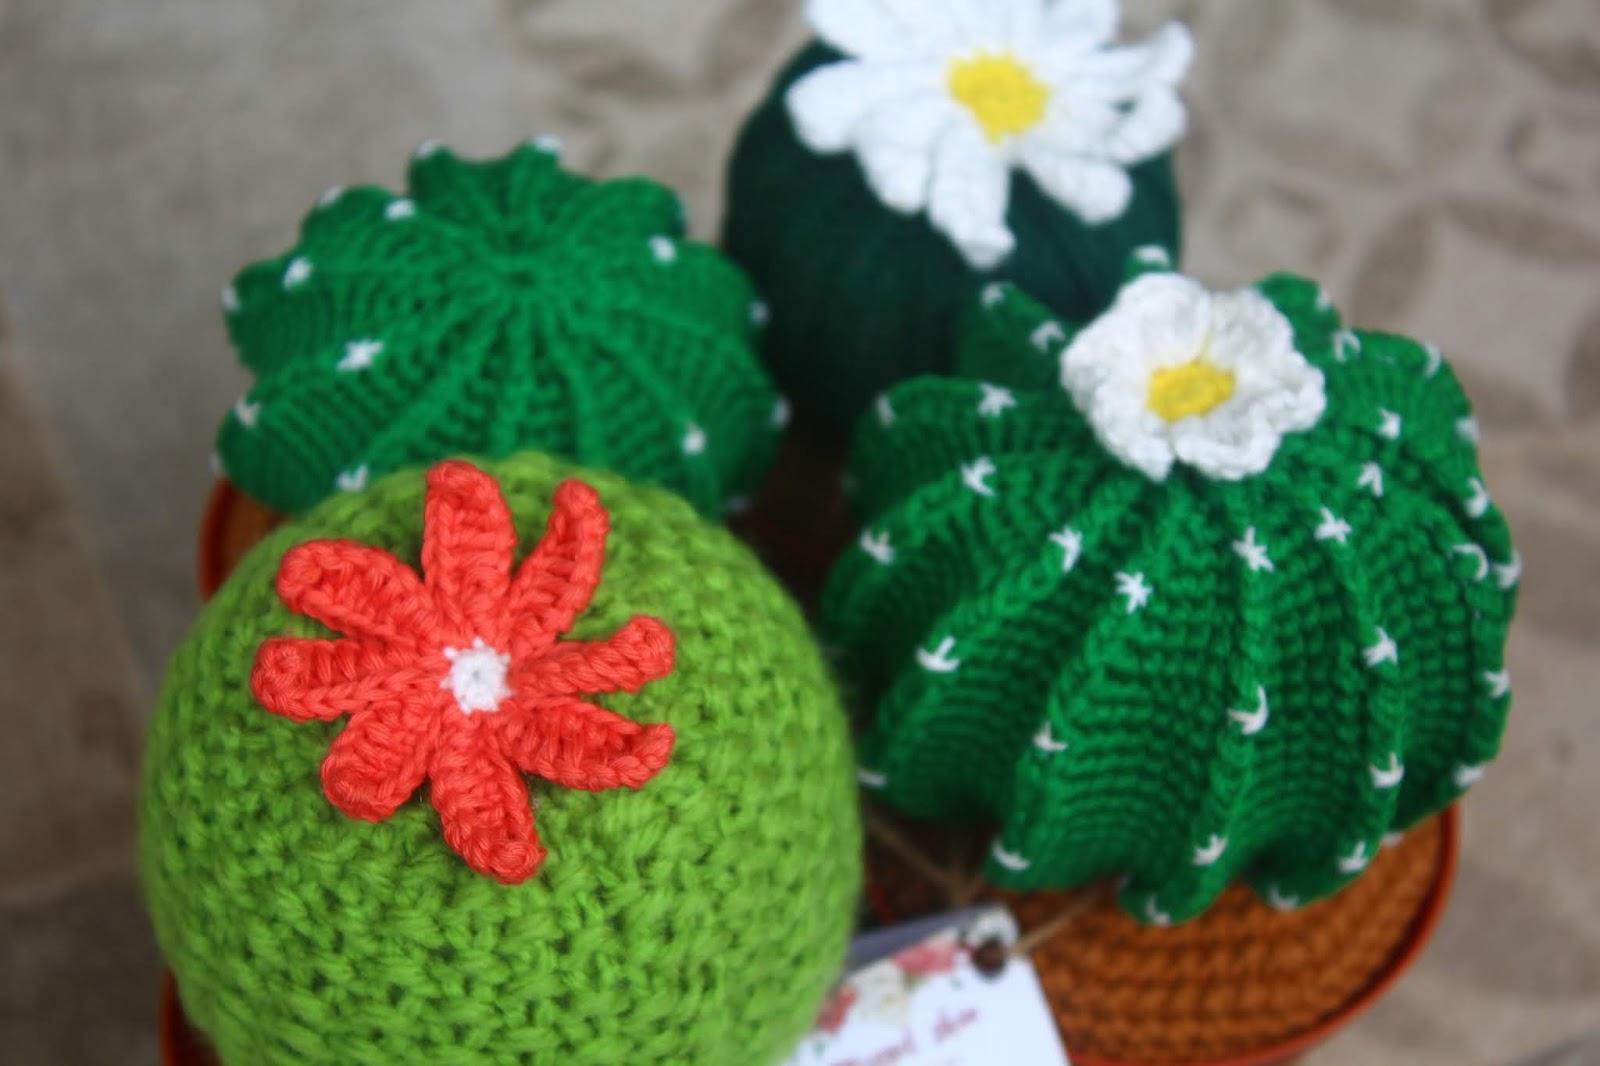 misyel shin Crochet designer: cara membuat amigurumi kaktus ... | 1066x1600